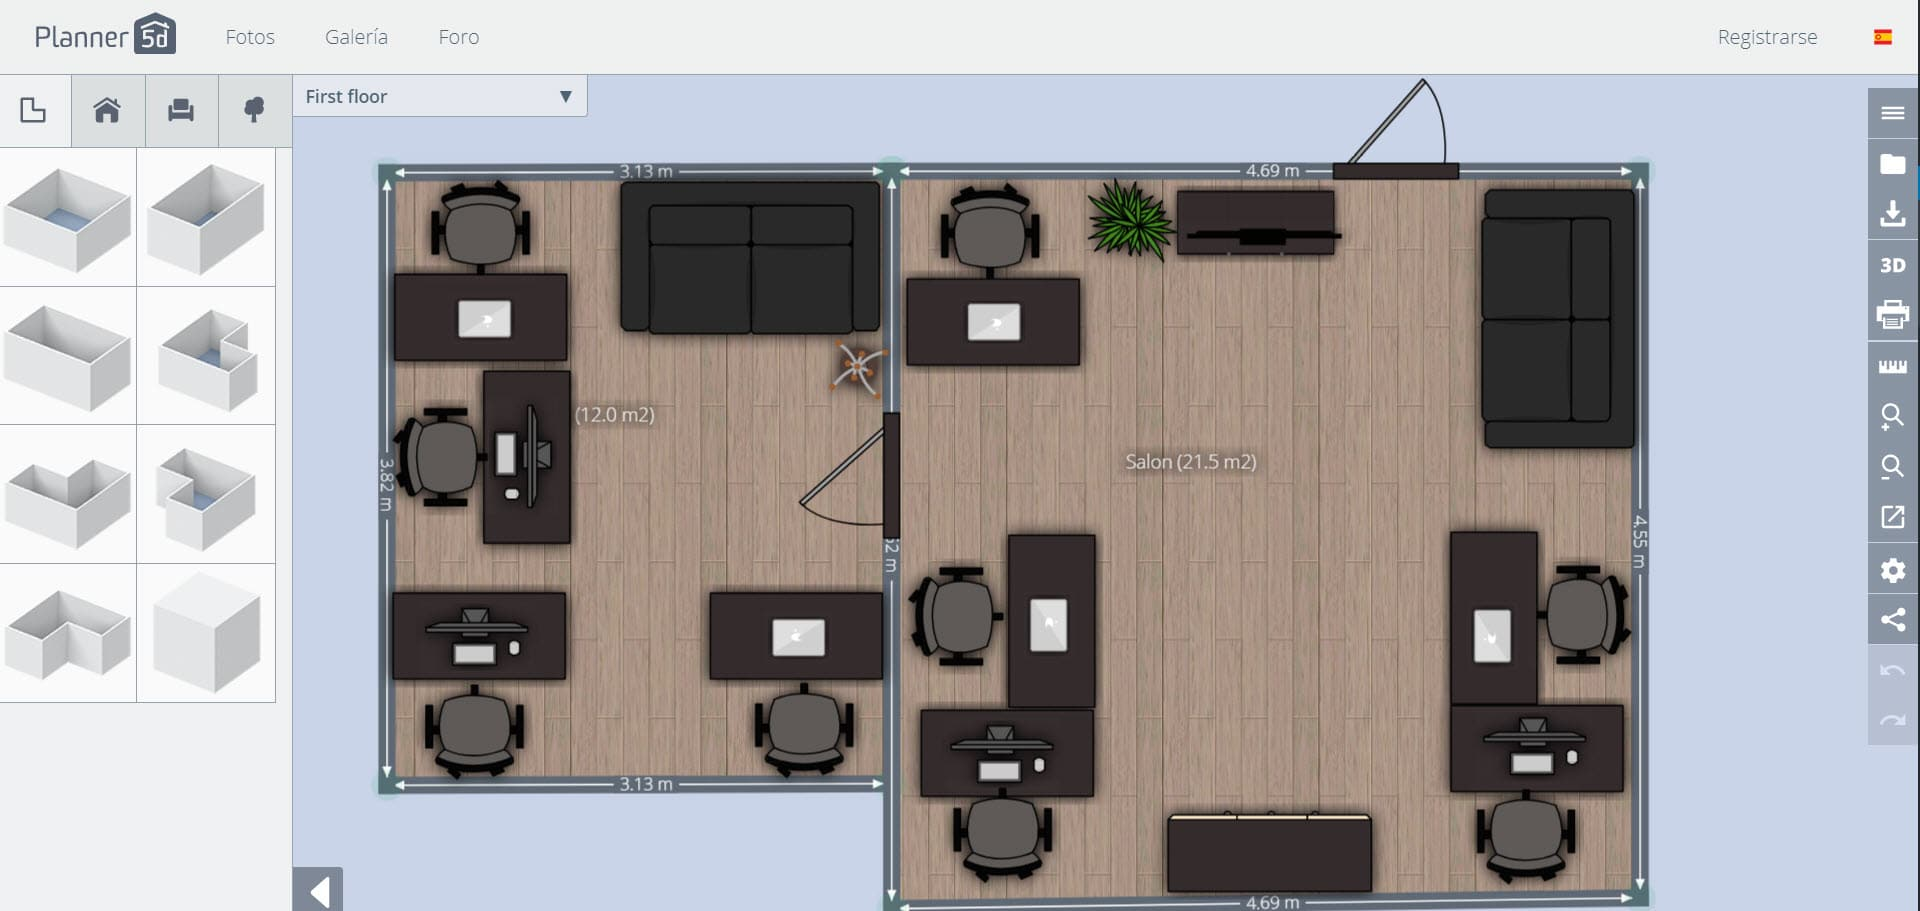 10 aplicaciones dise o de planos e interiores construye for App diseno casas